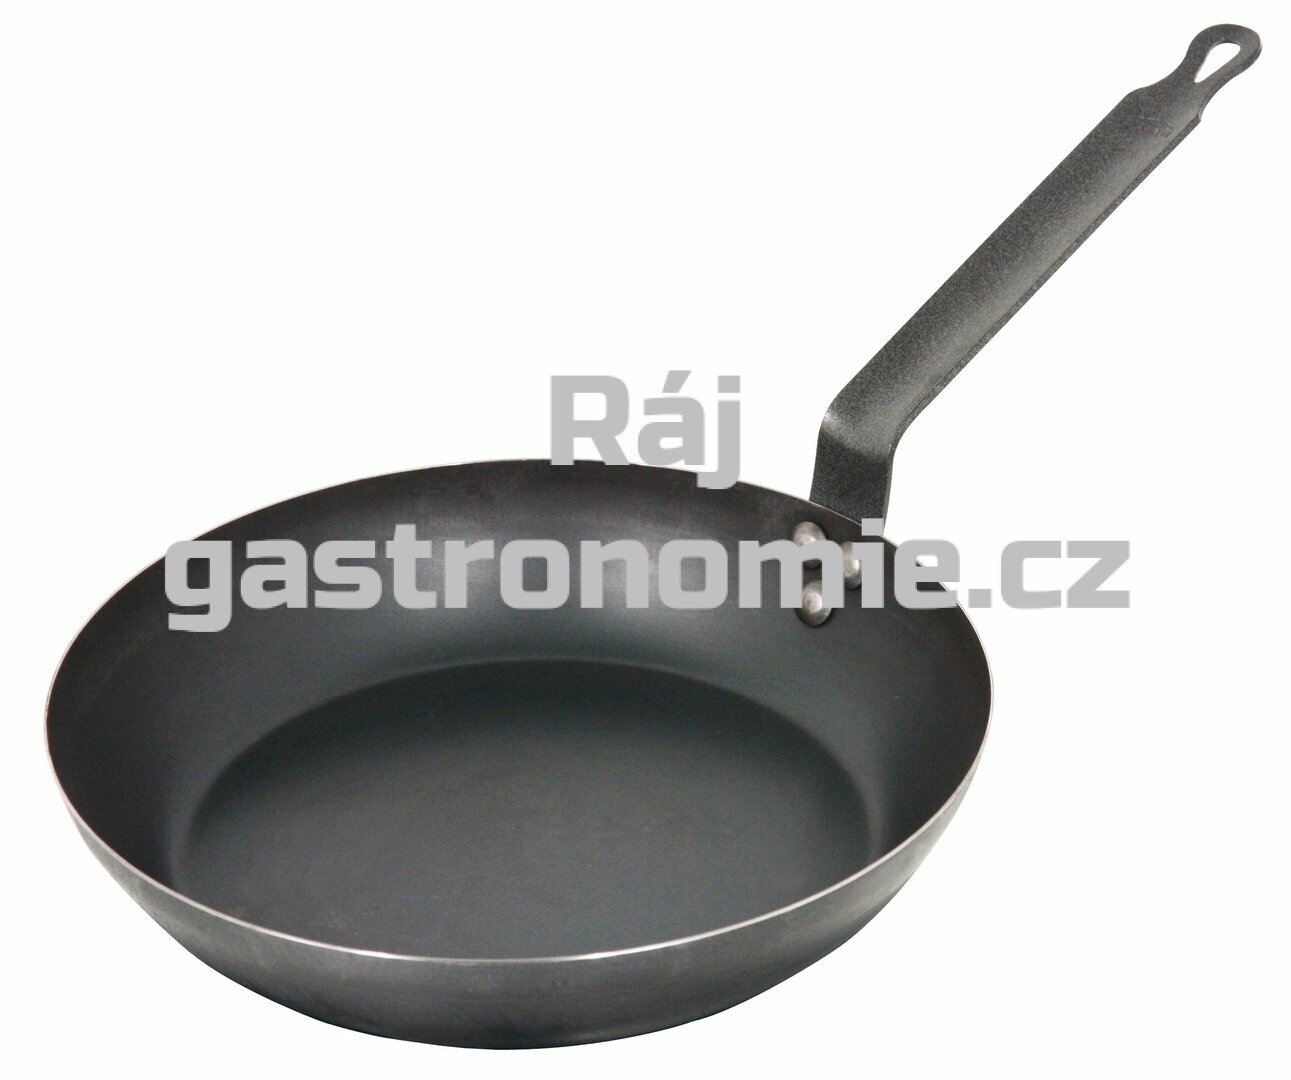 Pánev (Ø240 mm, hmotnost 0,70kg)